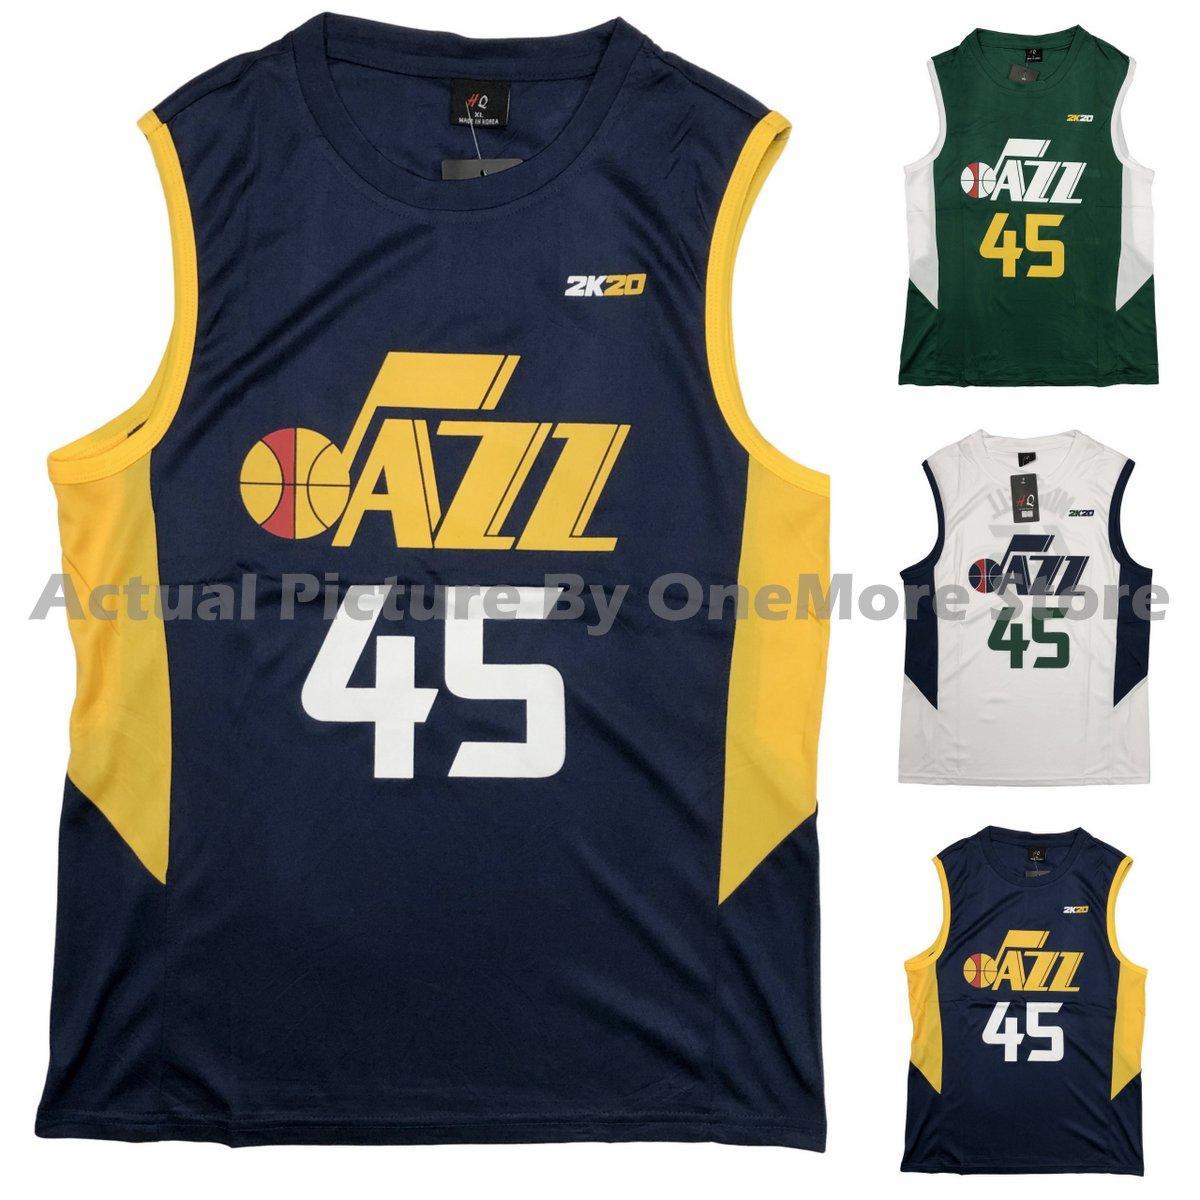 promo code dec46 cfe89 OneMore NBA Jersey Jazz #45 Mitchell Drifit Jersey Good Quality